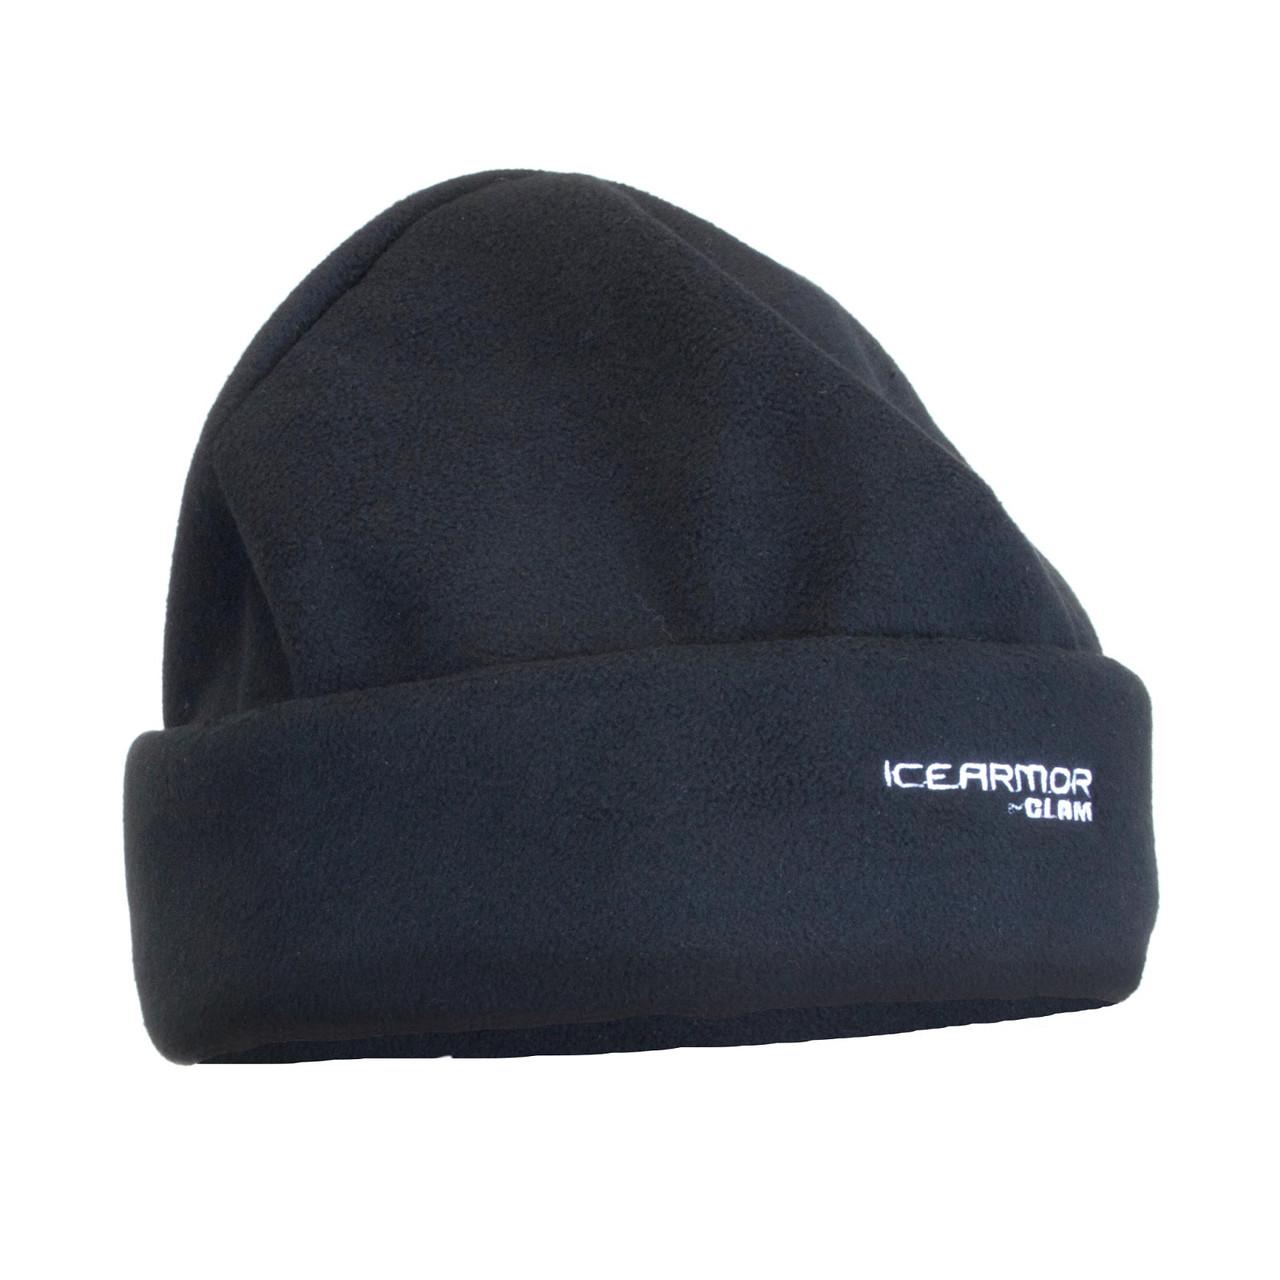 Clam IceArmor Fleece Toque